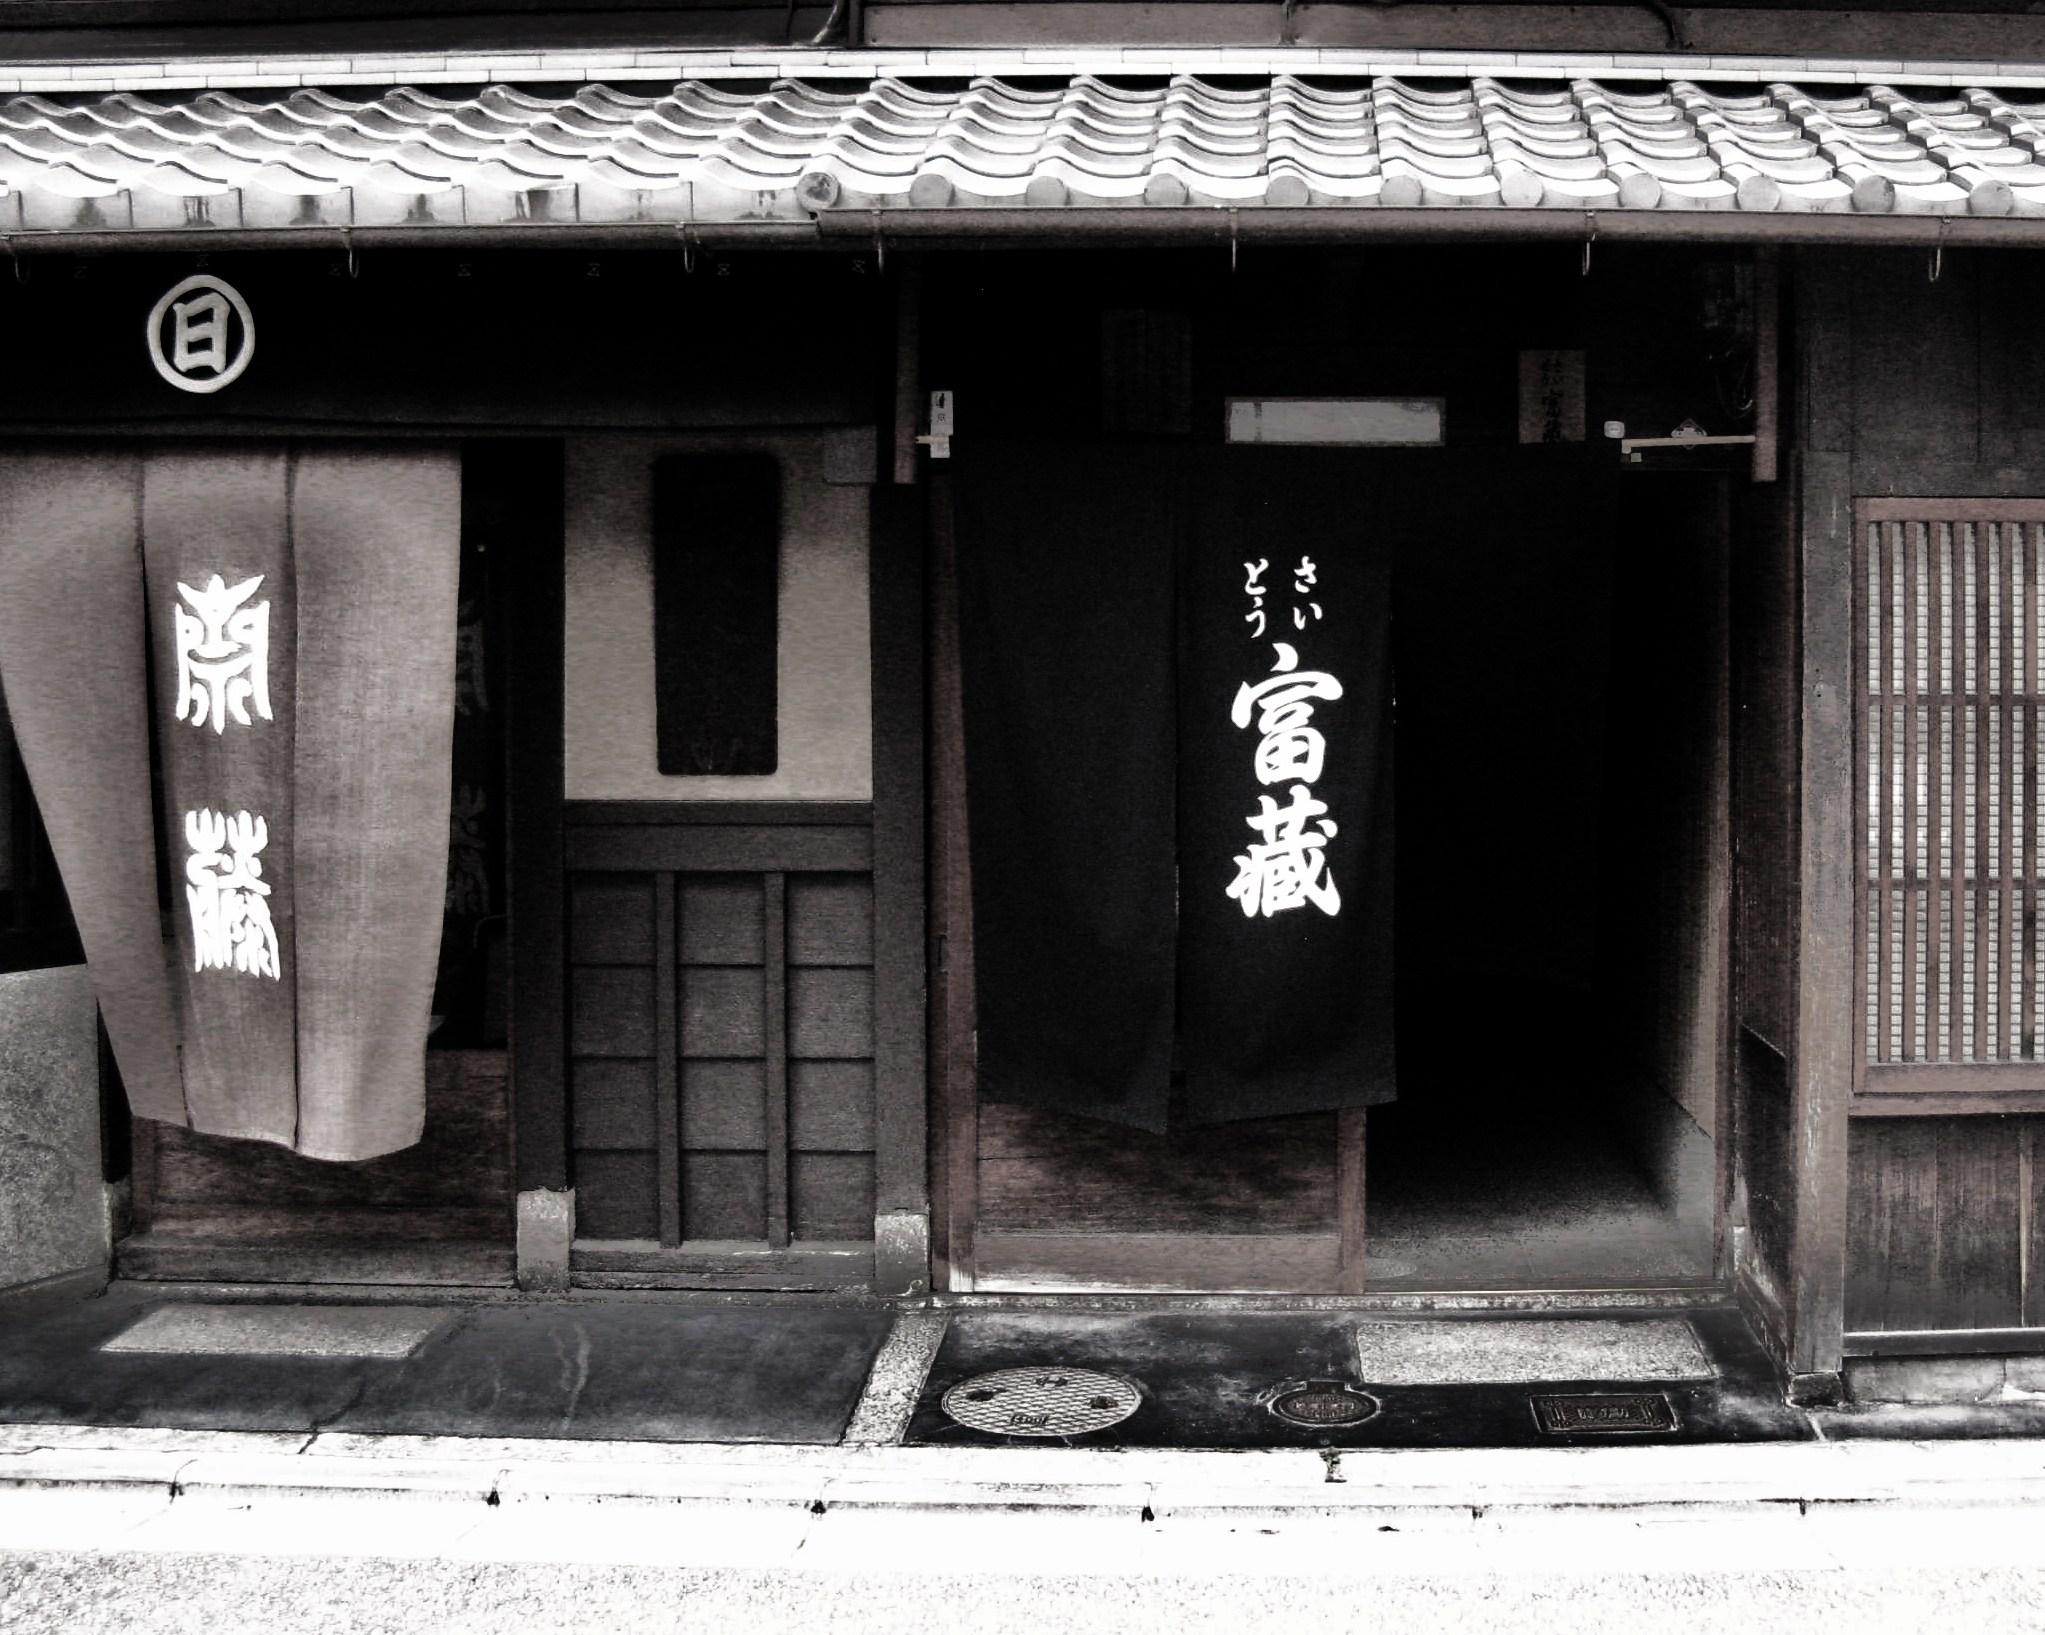 essay kyoto nothingness philosopher school